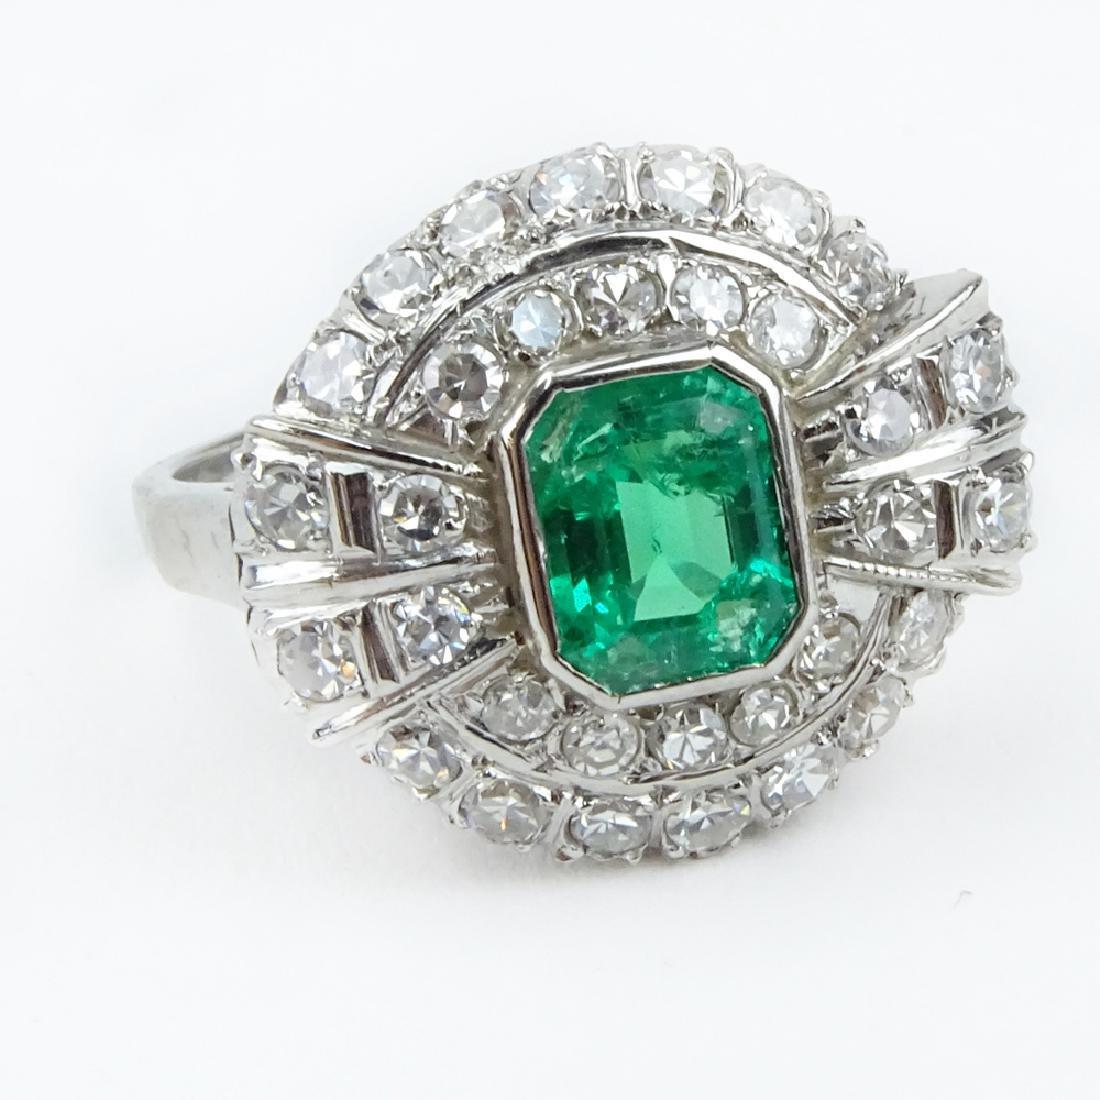 Vintage Approx. 1.75 Carat Emerald and Diamond Platinum